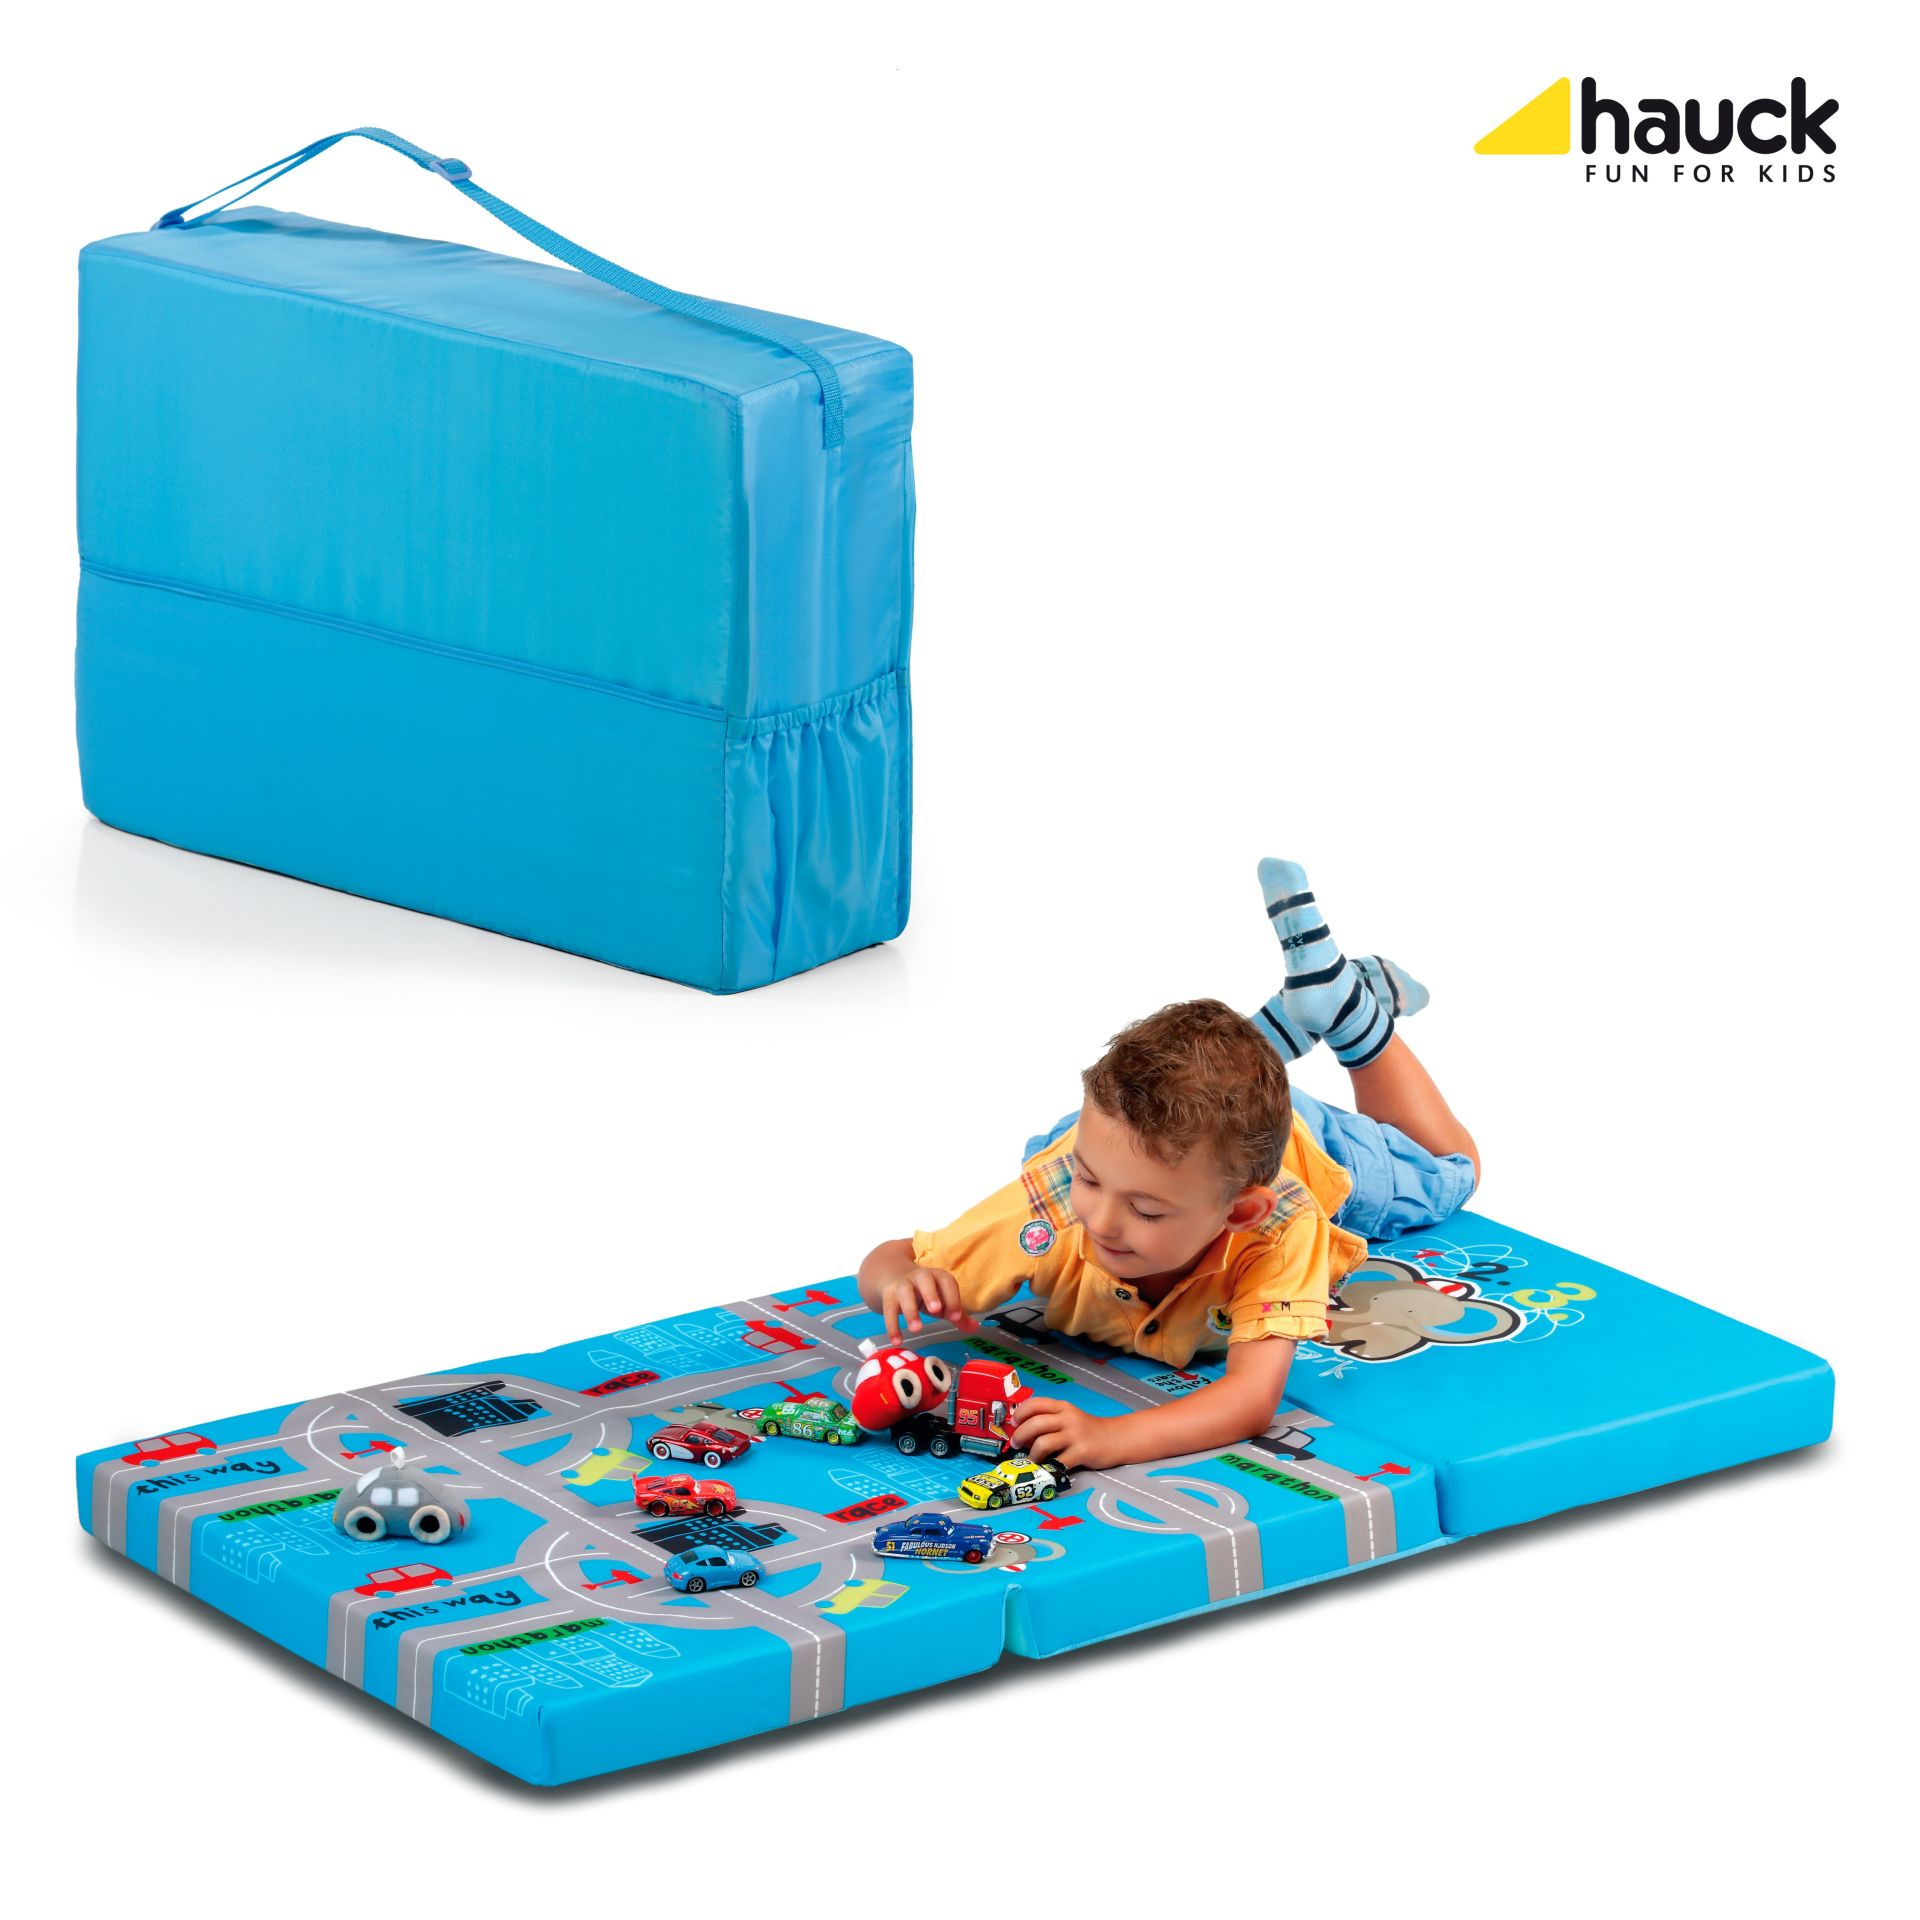 Hauck Sleeper Travel Cot Mattress 2018 Playpark Buy At